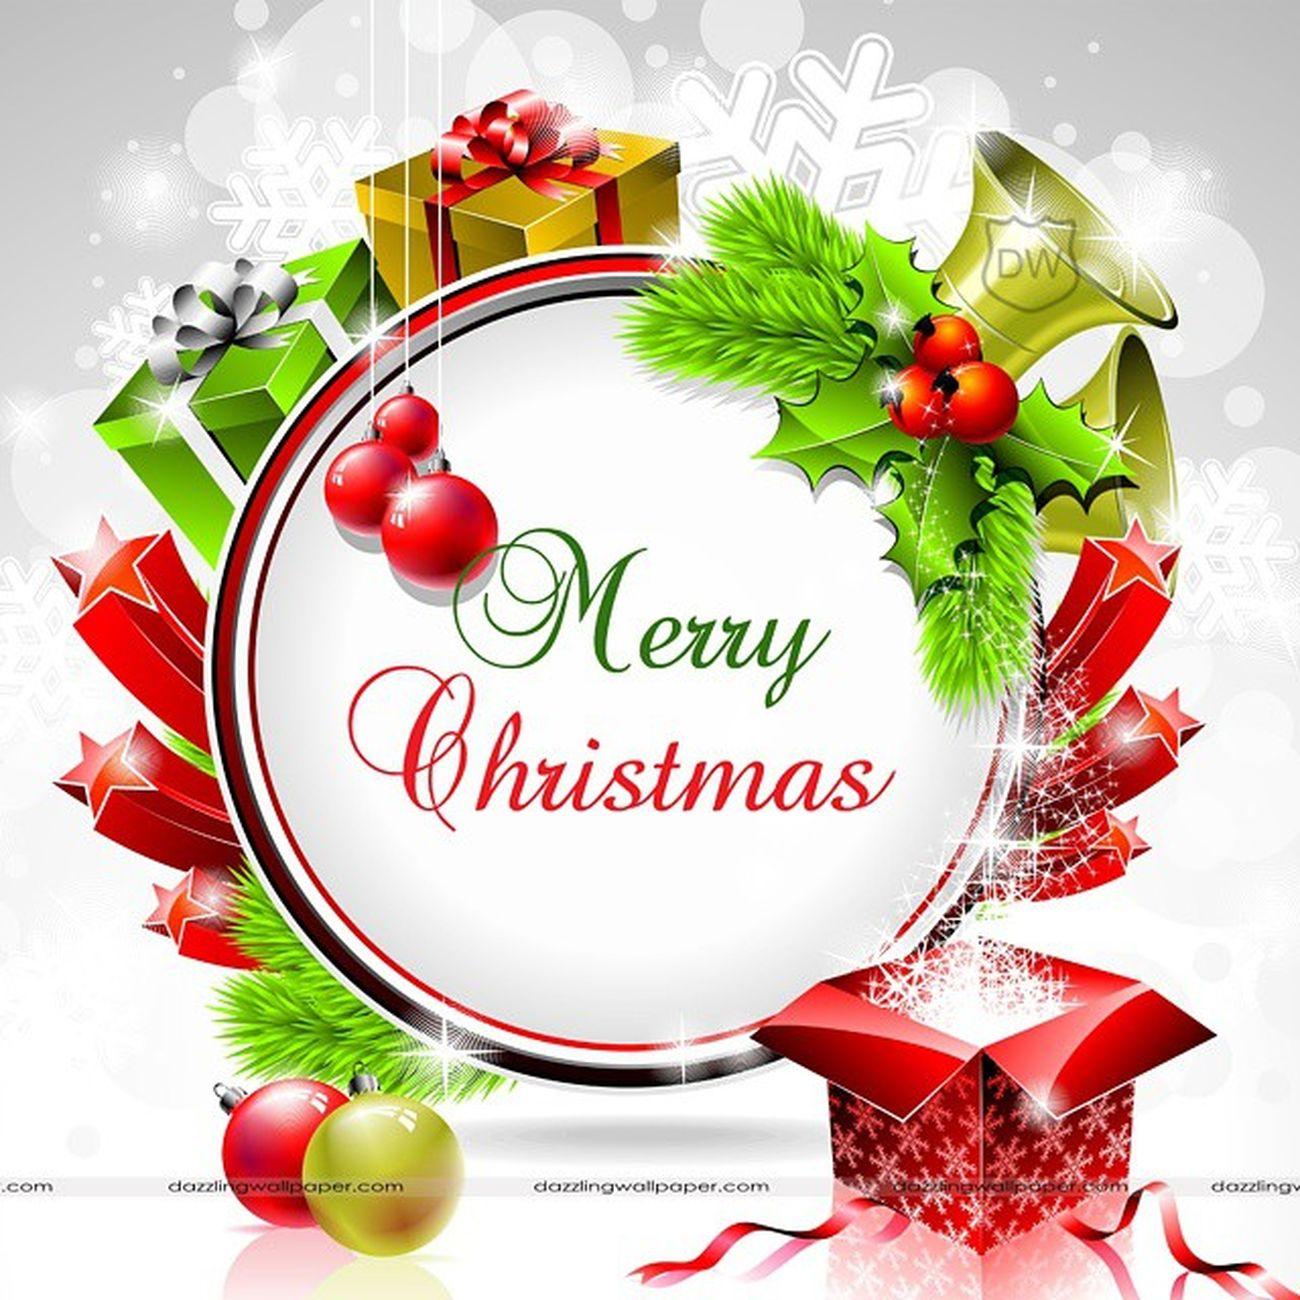 Santa MerryChristmas 25thDecember Instalikes tagsforlikes